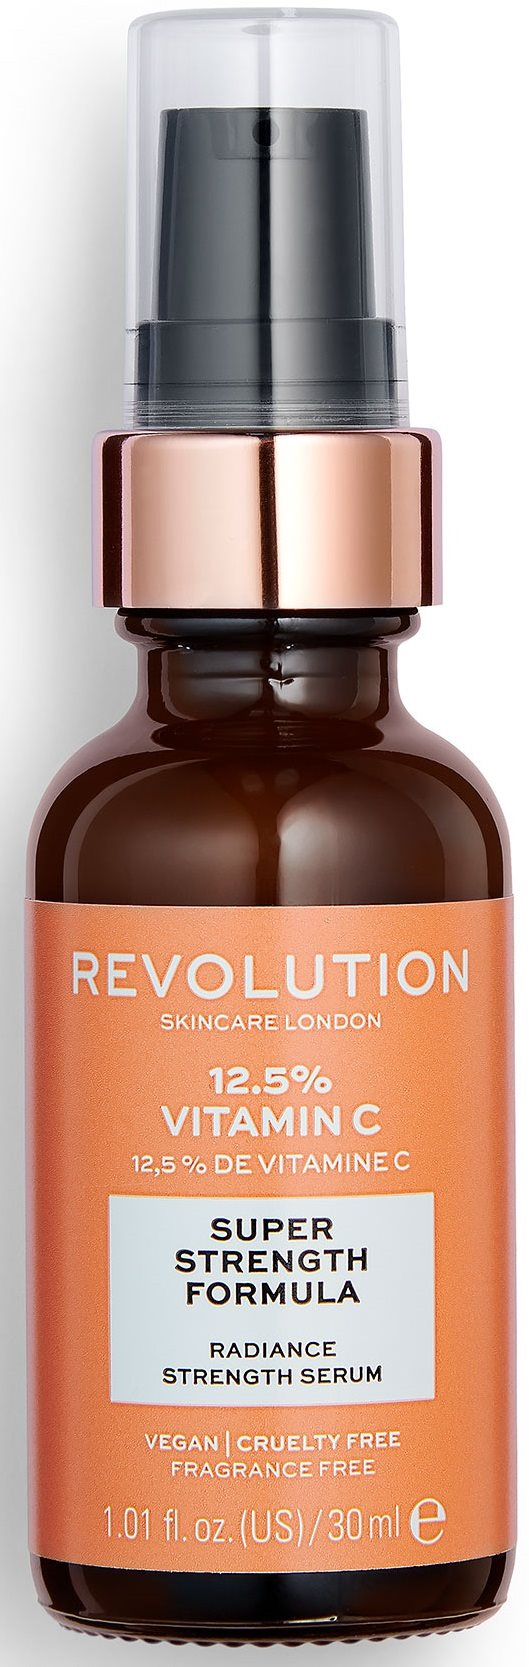 REVOLUTION SKINCARE 12.5% Vitamin C 30 ml